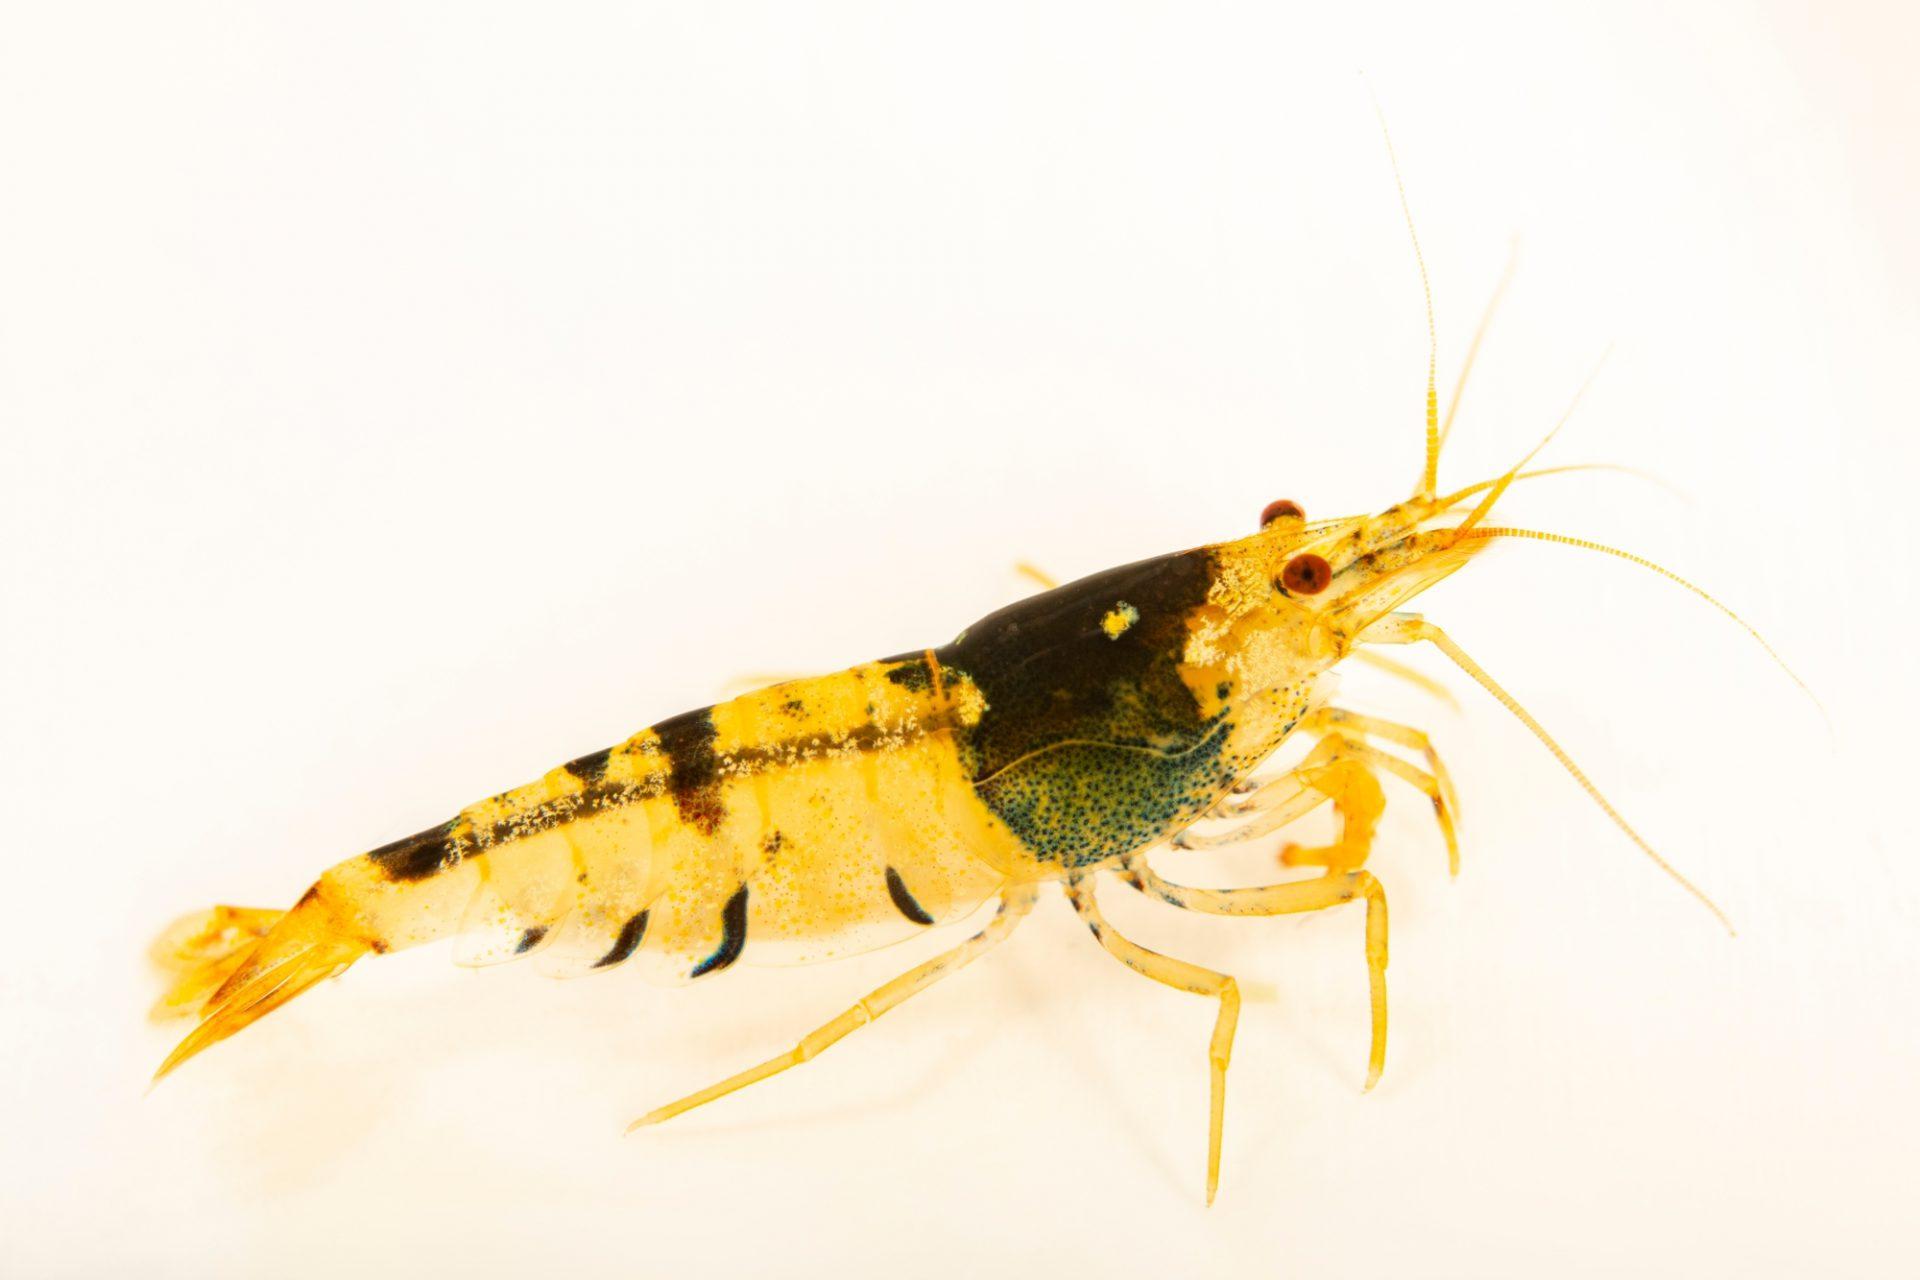 Photo: Crystal shrimp (Caridina cantonesis) locality China/Hong Kong, from a private collection.